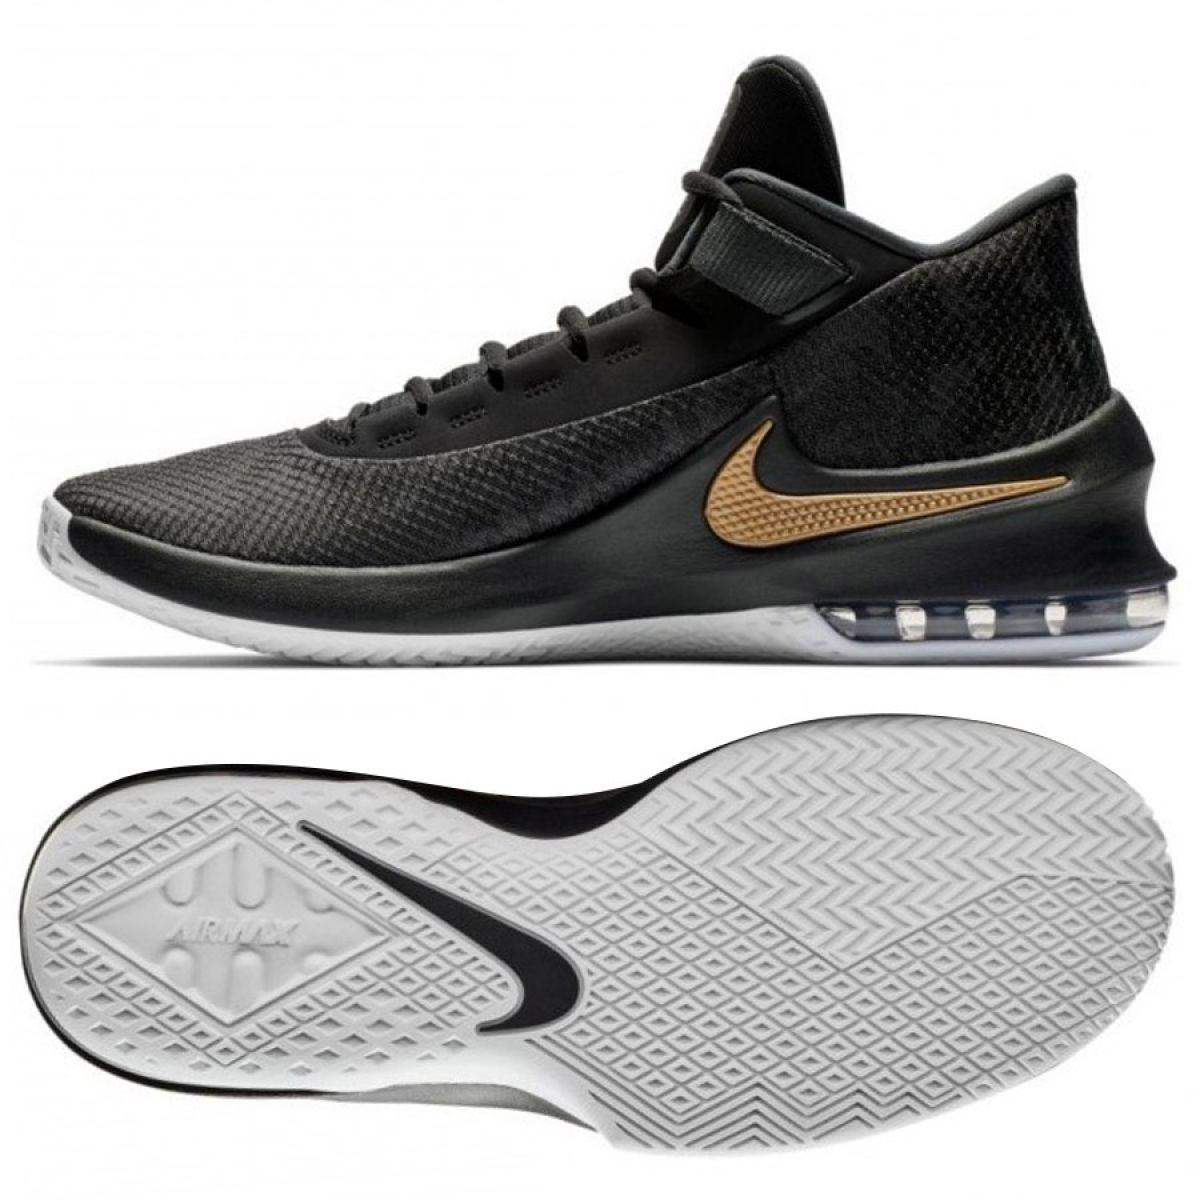 Tênis de basquete Nike Air Max Infuriate 2 Mid M AA7066 002 preto preto